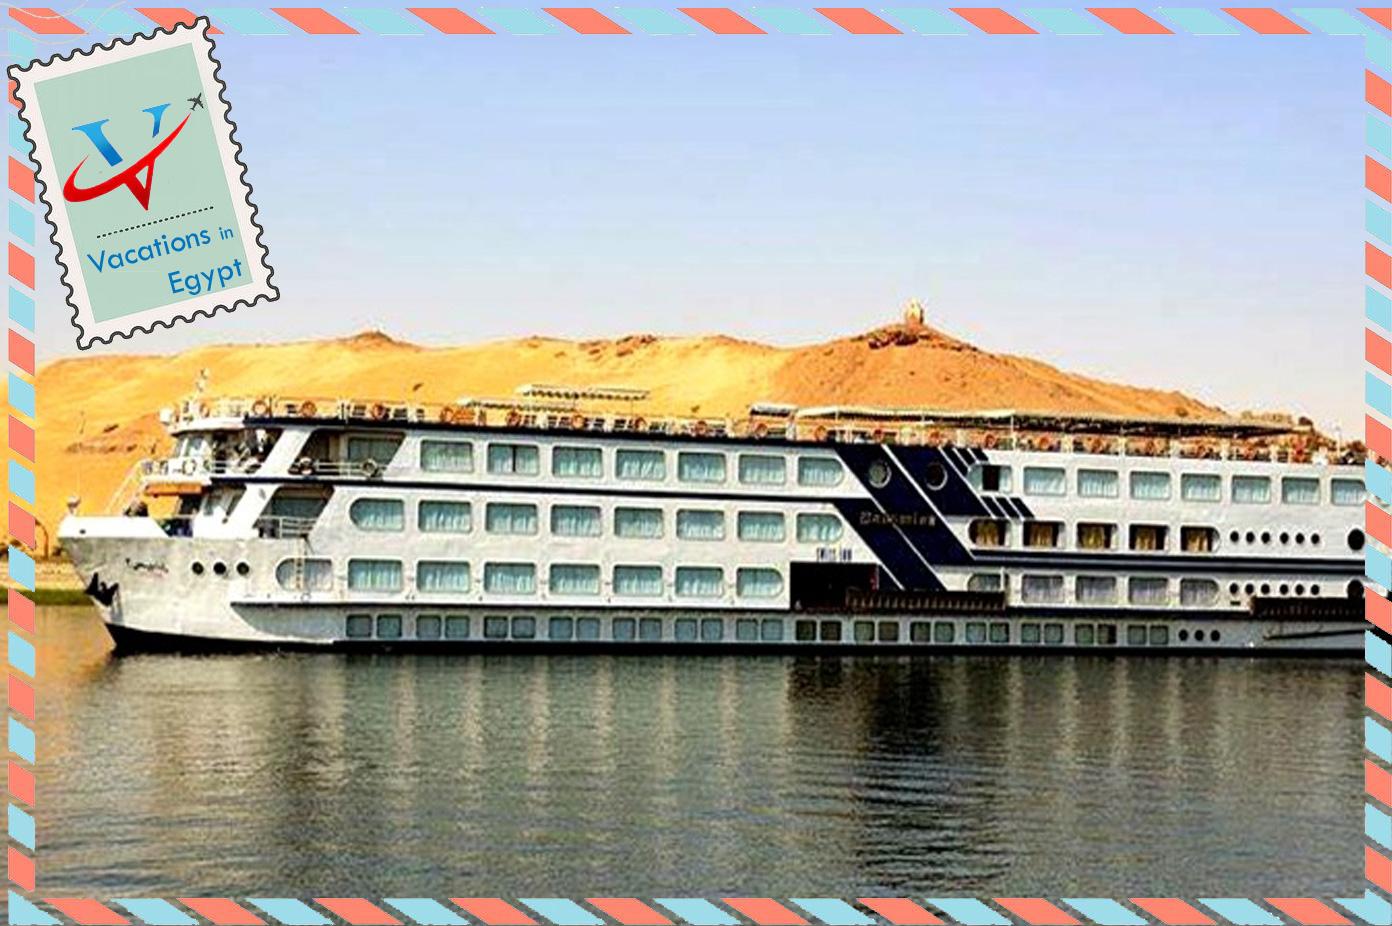 MS Radamis II Nile Cruise